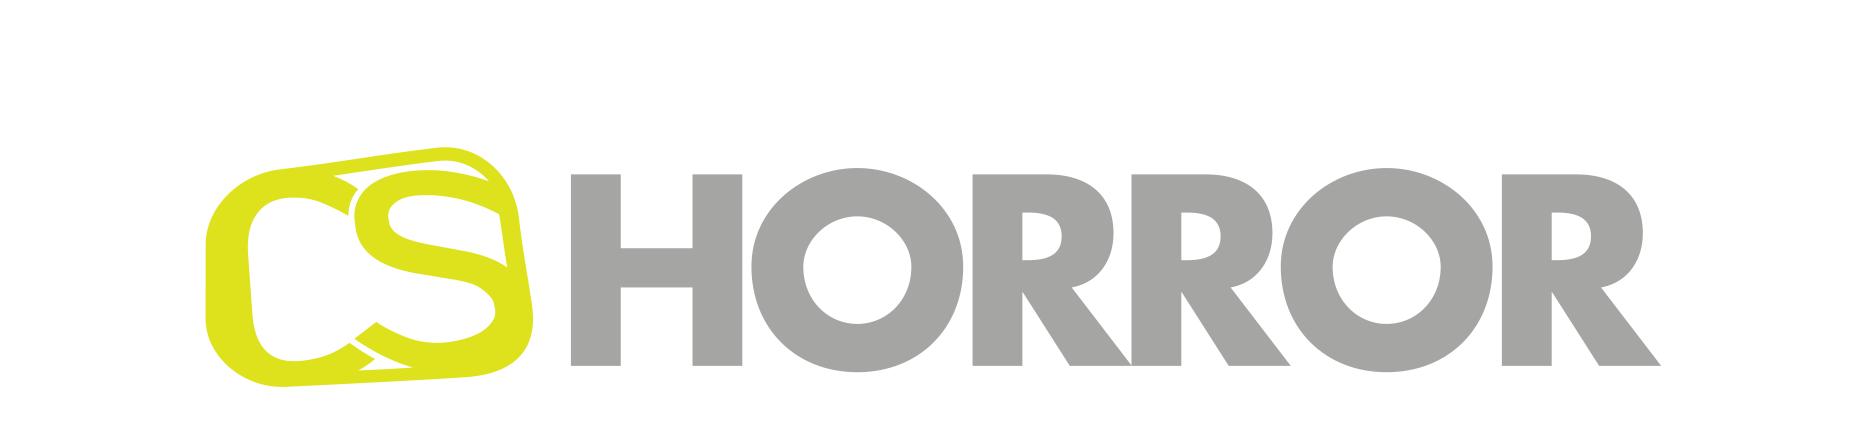 logo CS HORROR